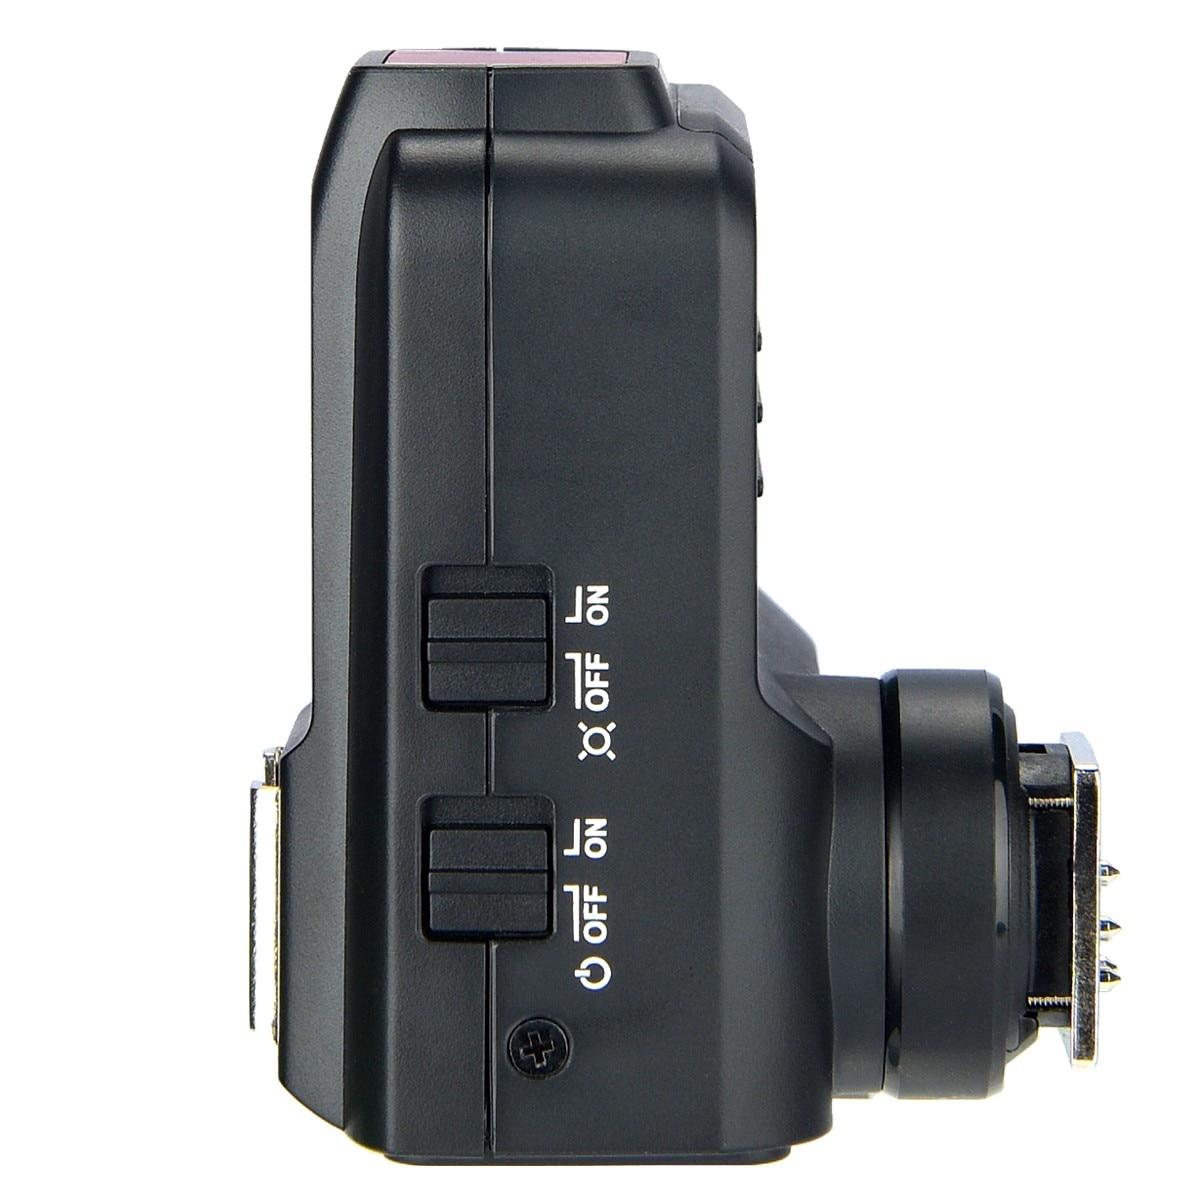 Godox X2T-C X2T-N X2T-S X2T-F X2T-O 2.4G TTL HSS Transmitter Wireless Flash Trigger for Canon Nikon Sony Fuji Olympus